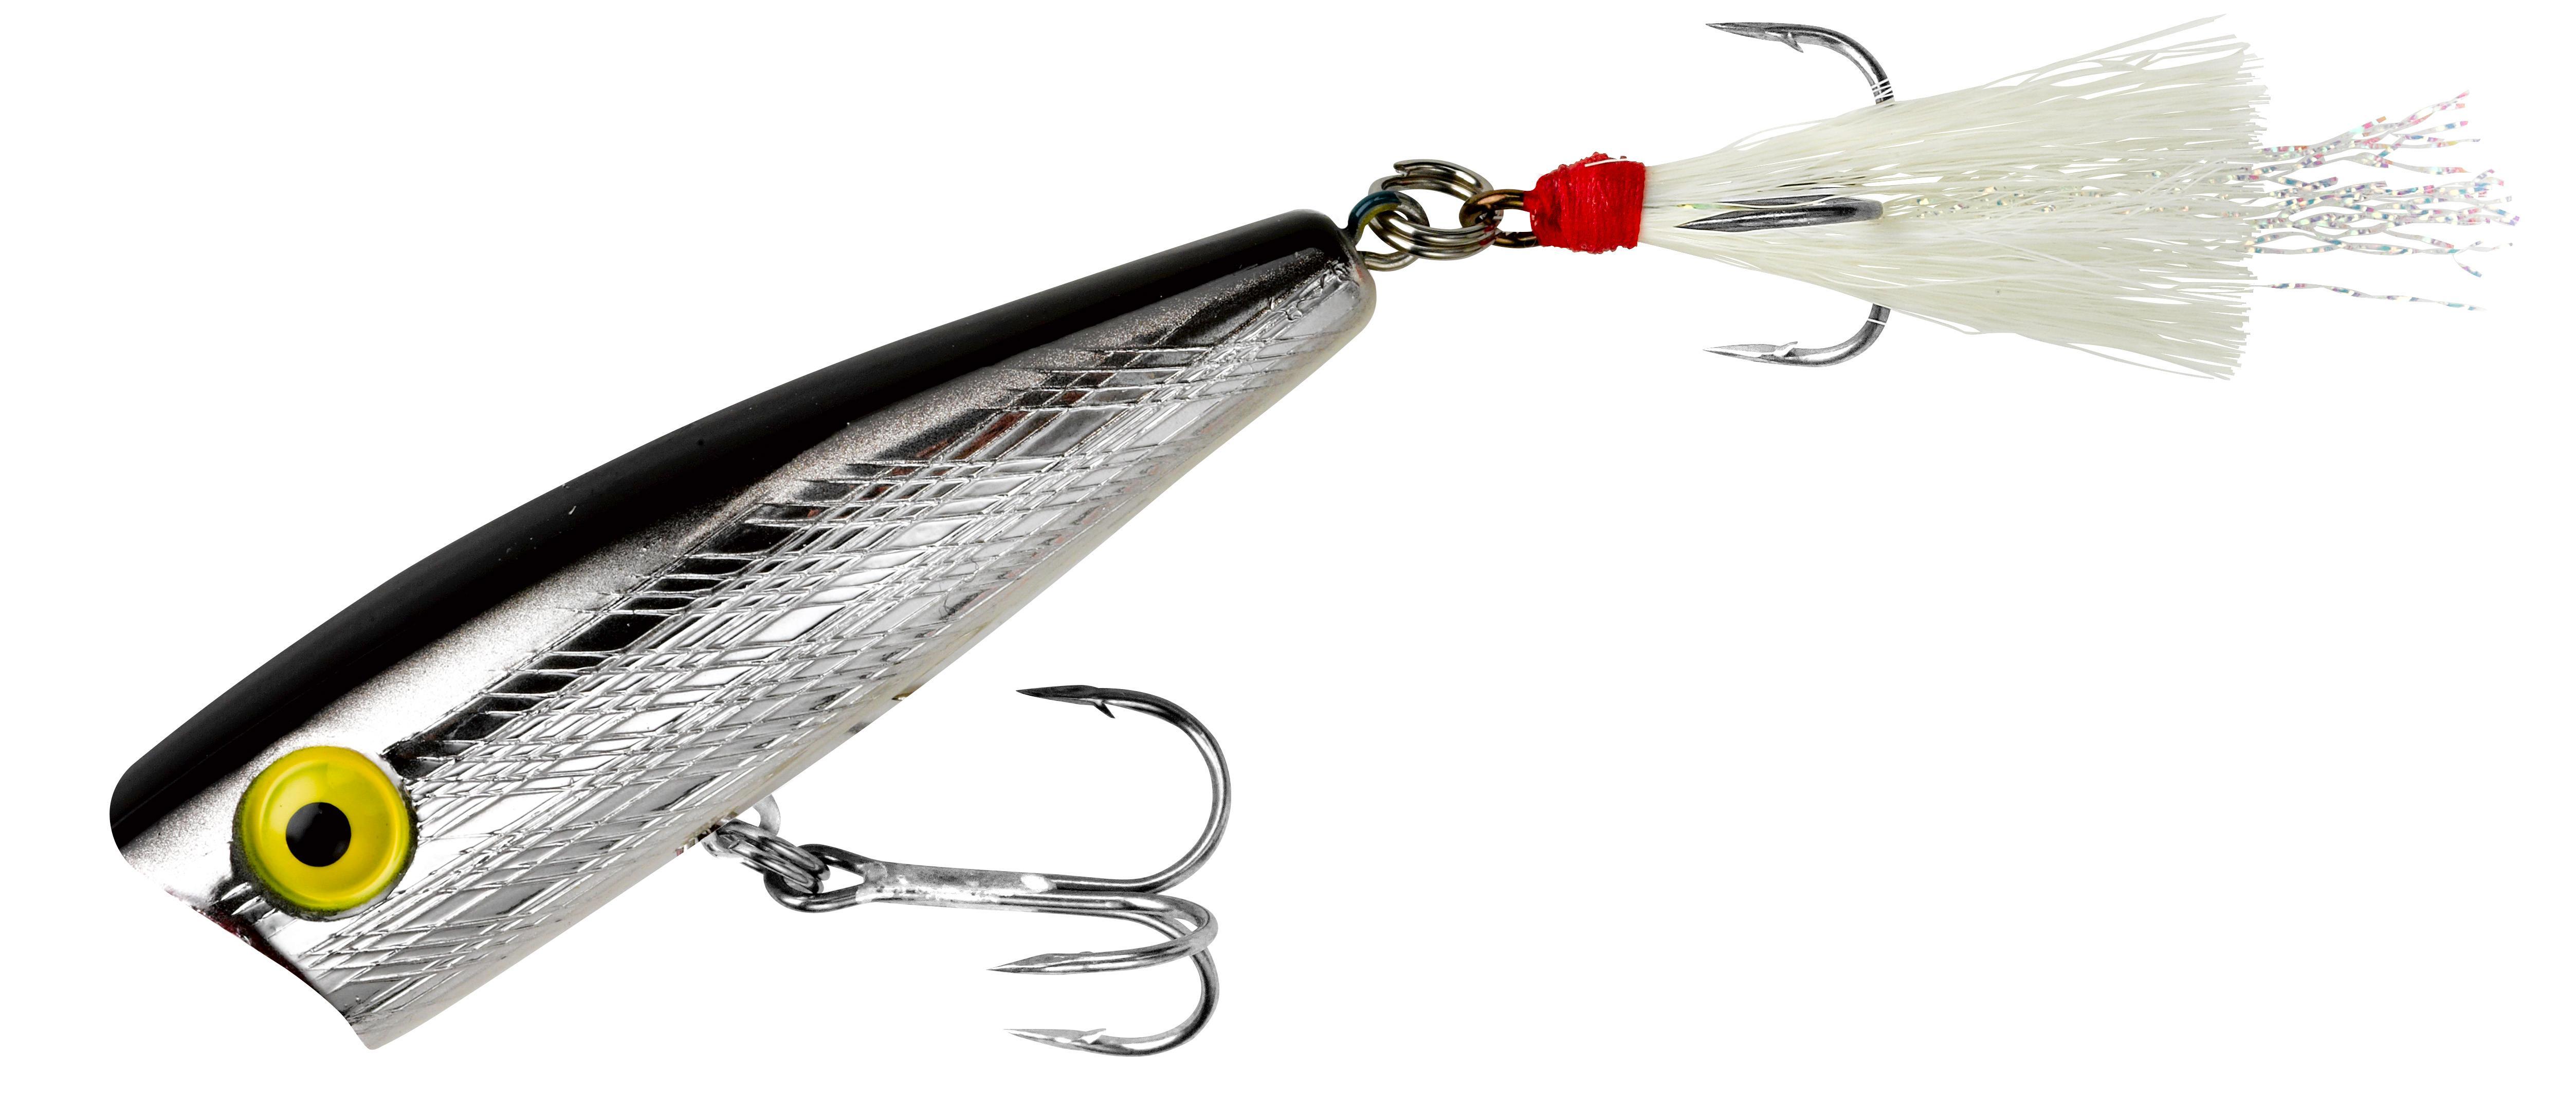 Rebel pop r fishing lure bone fishing for Amazon fishing lures